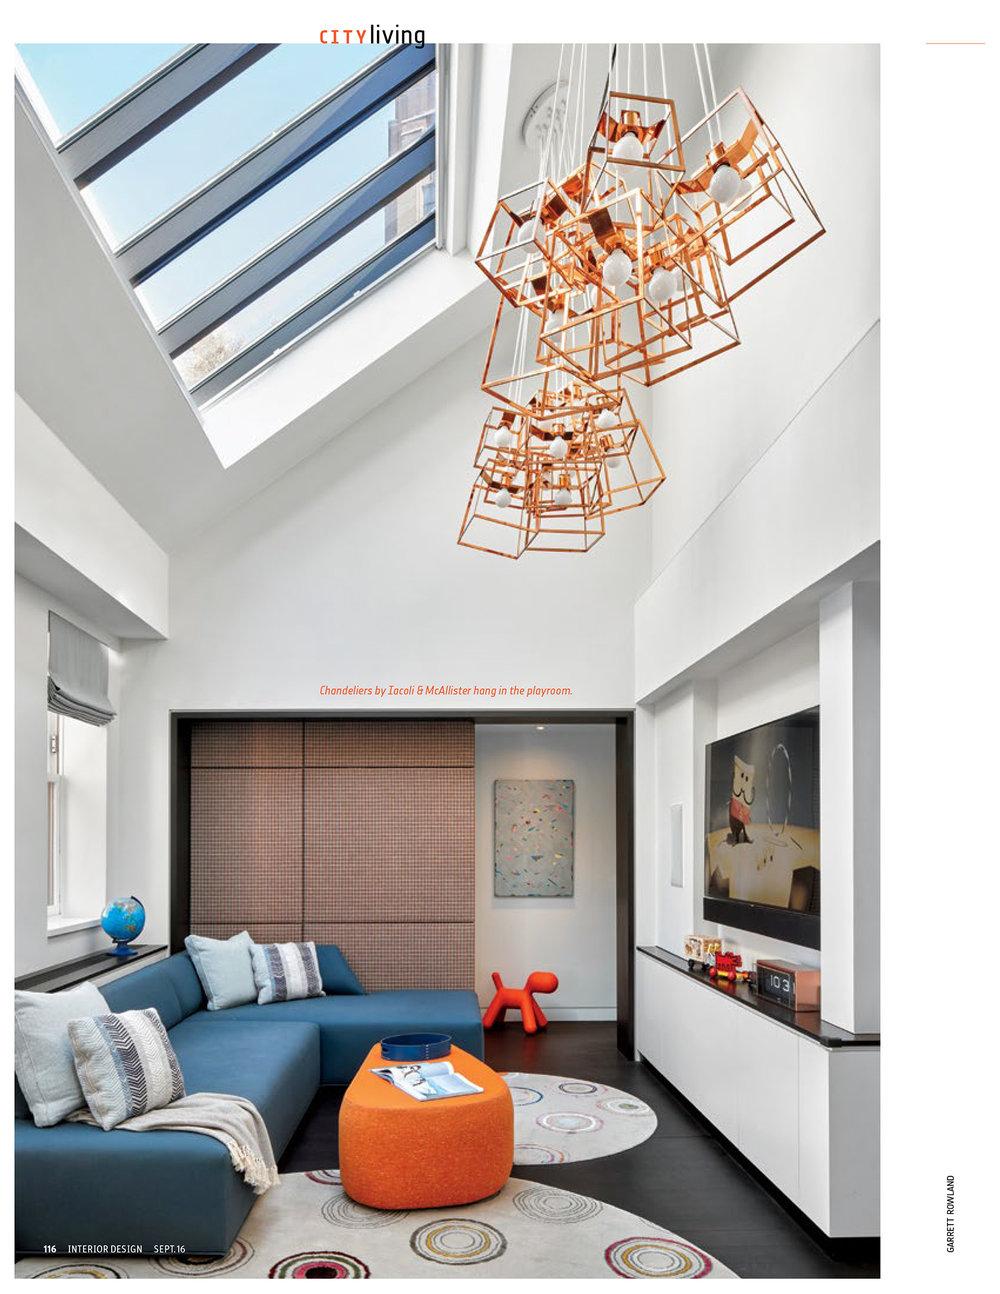 Design by Damon Liss Design / Photo by Garrett Rowland for Interior Design Magazine